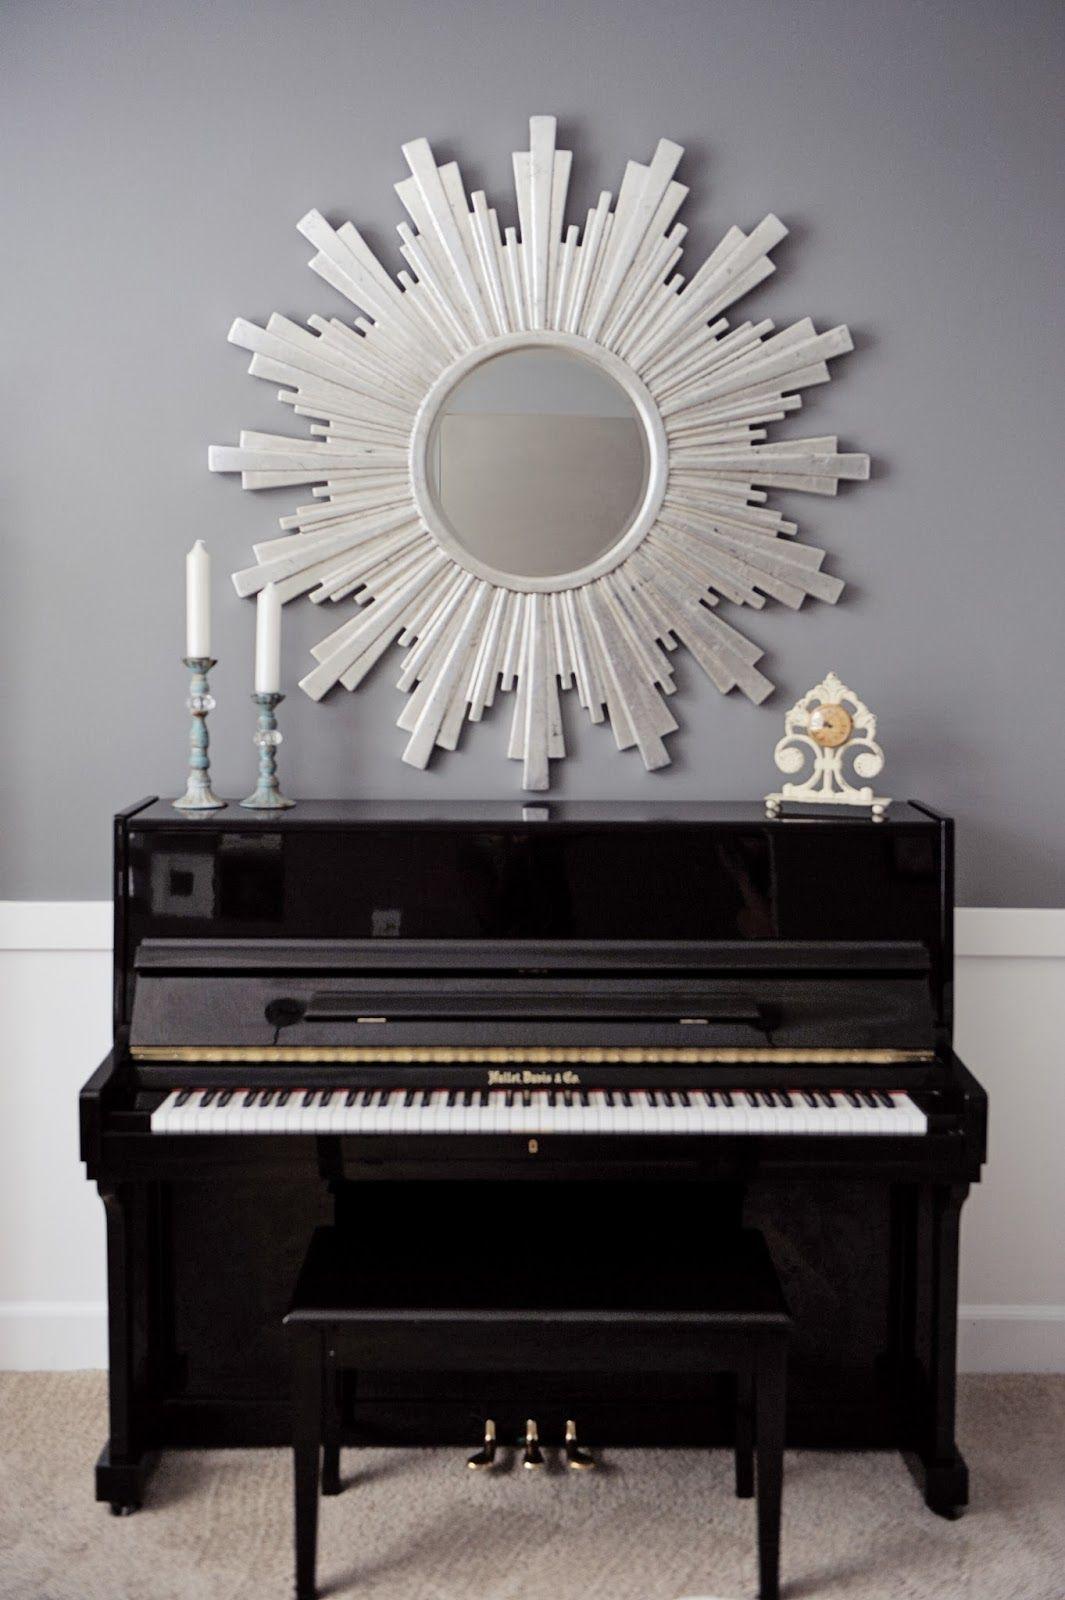 Sunburst Mirror over upright piano...Grandma's white baby grand instead